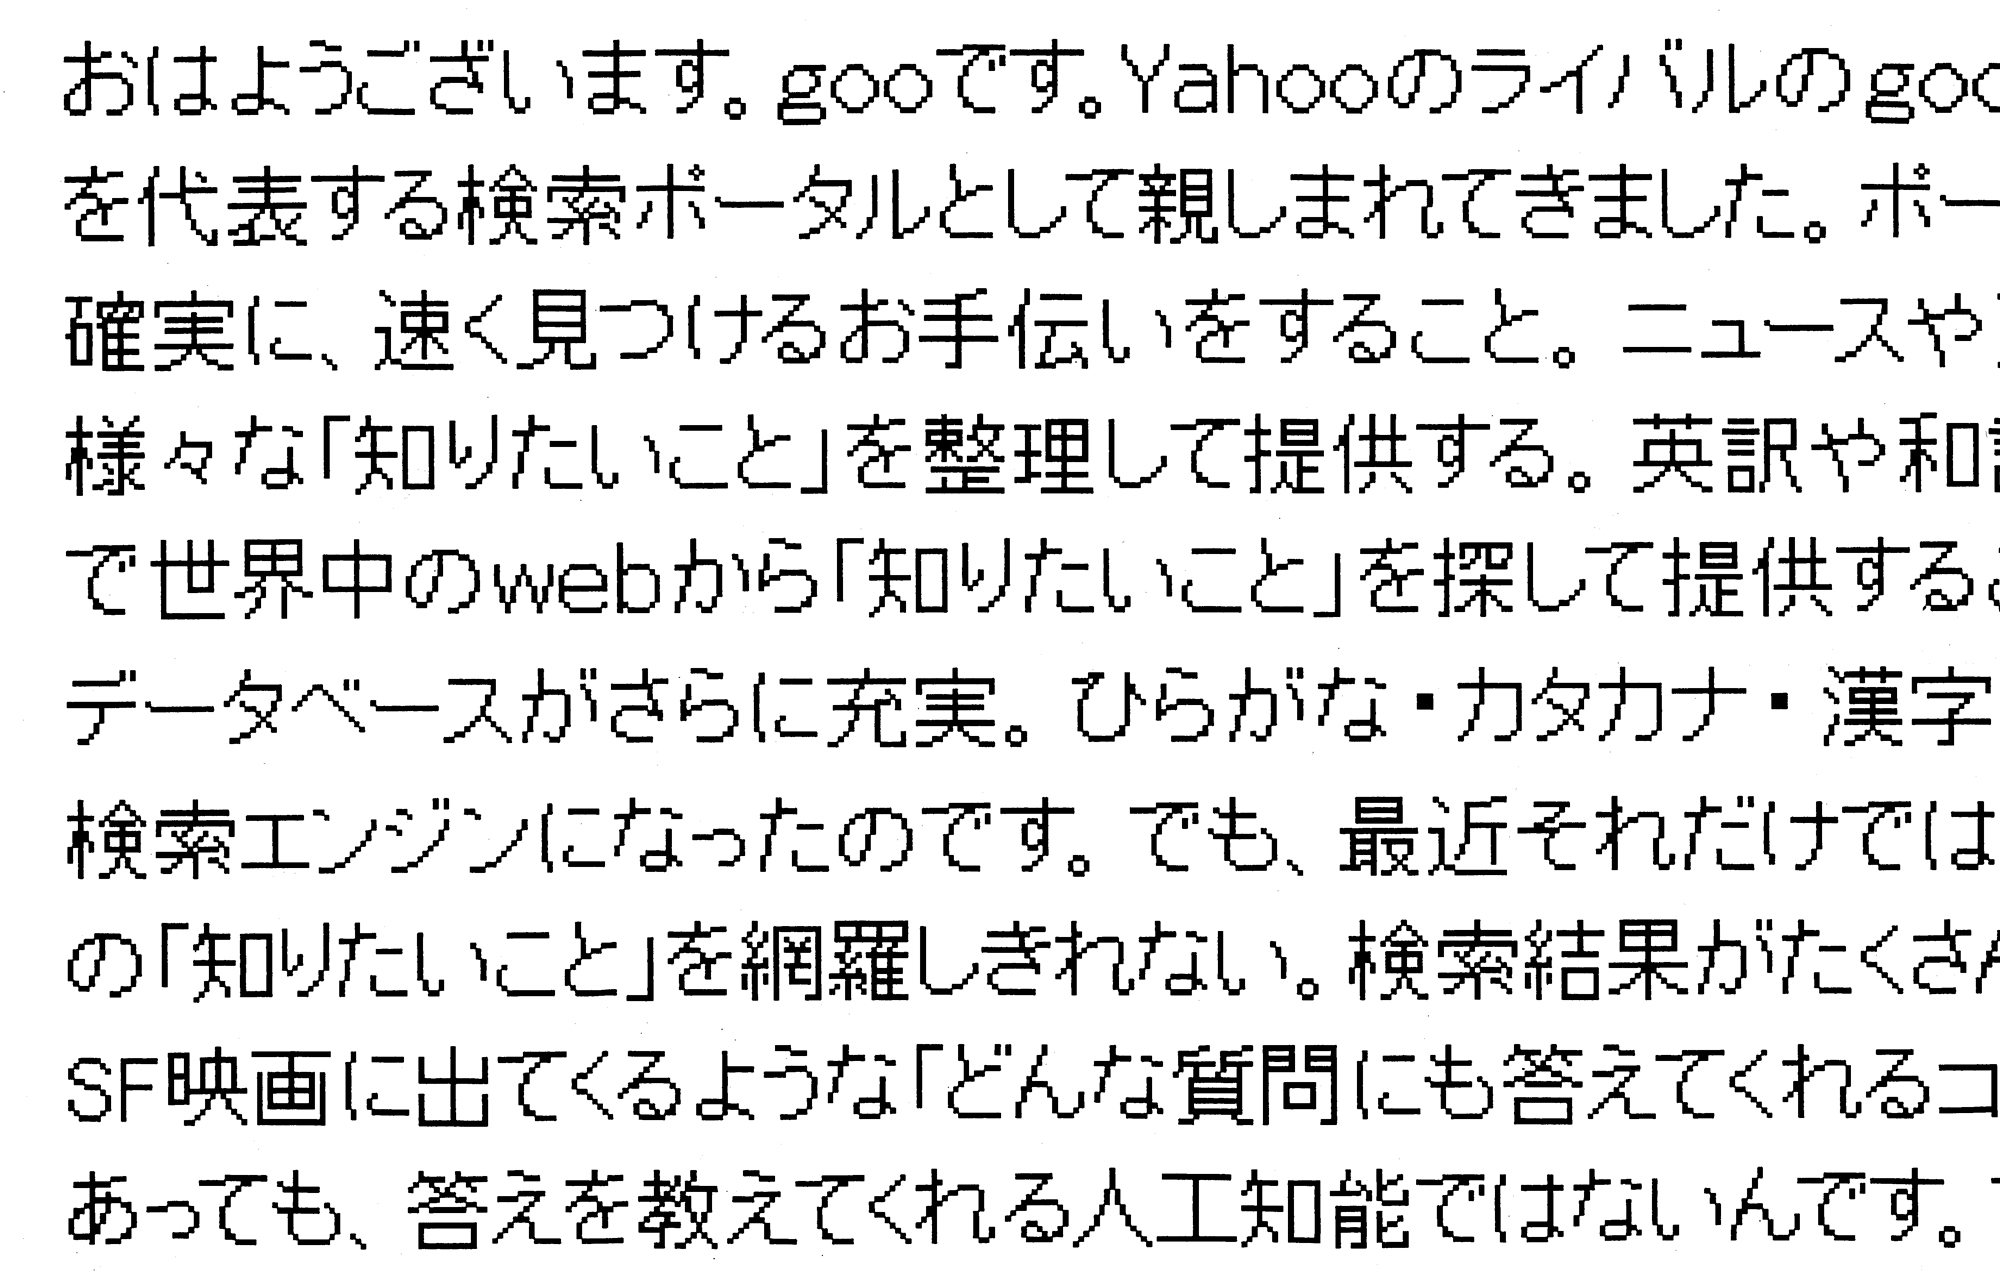 1_goo_2005年.jpg